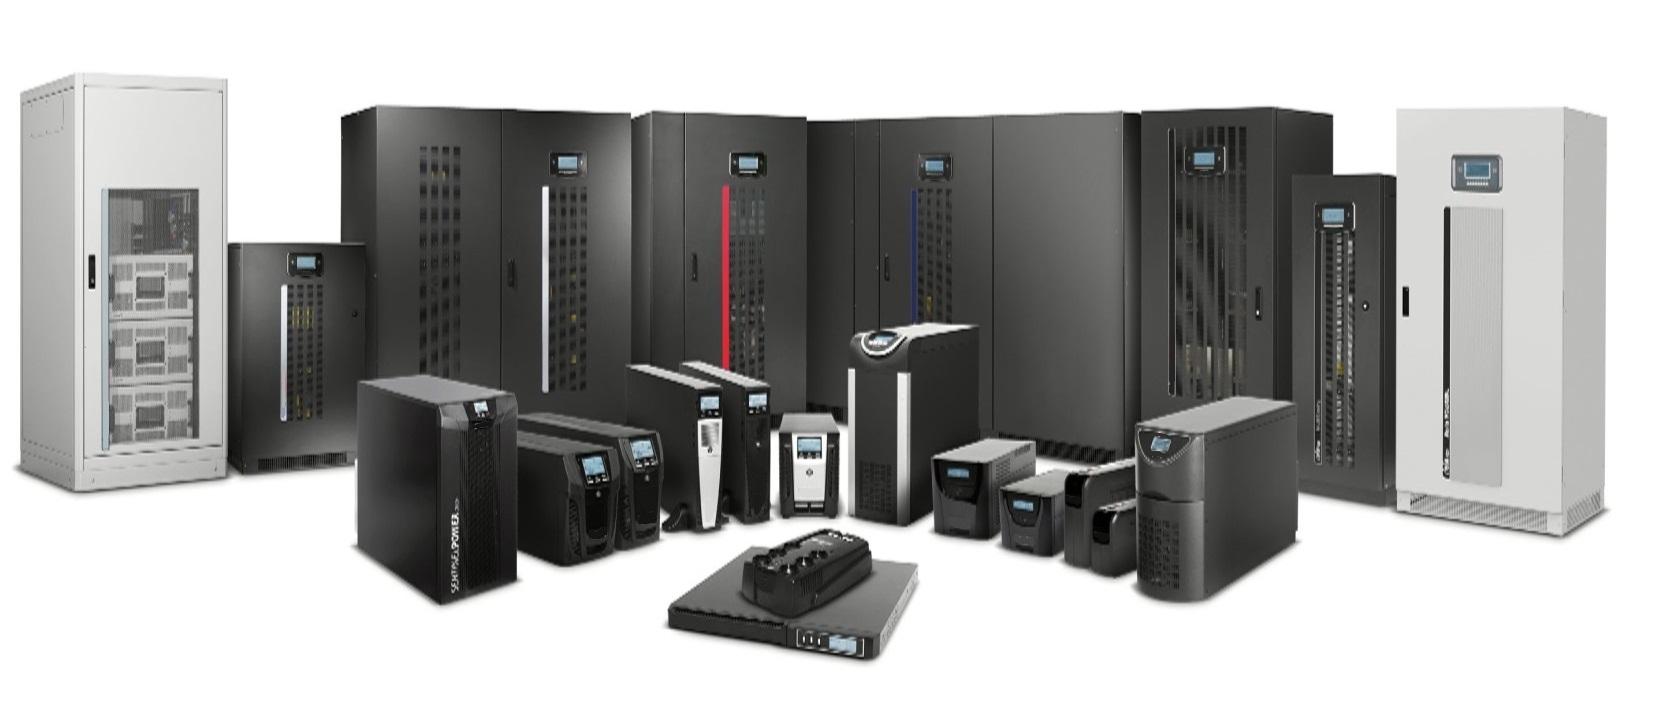 ups family دستگاه یو پی اس چیست؟ | یو پی اس | باتری